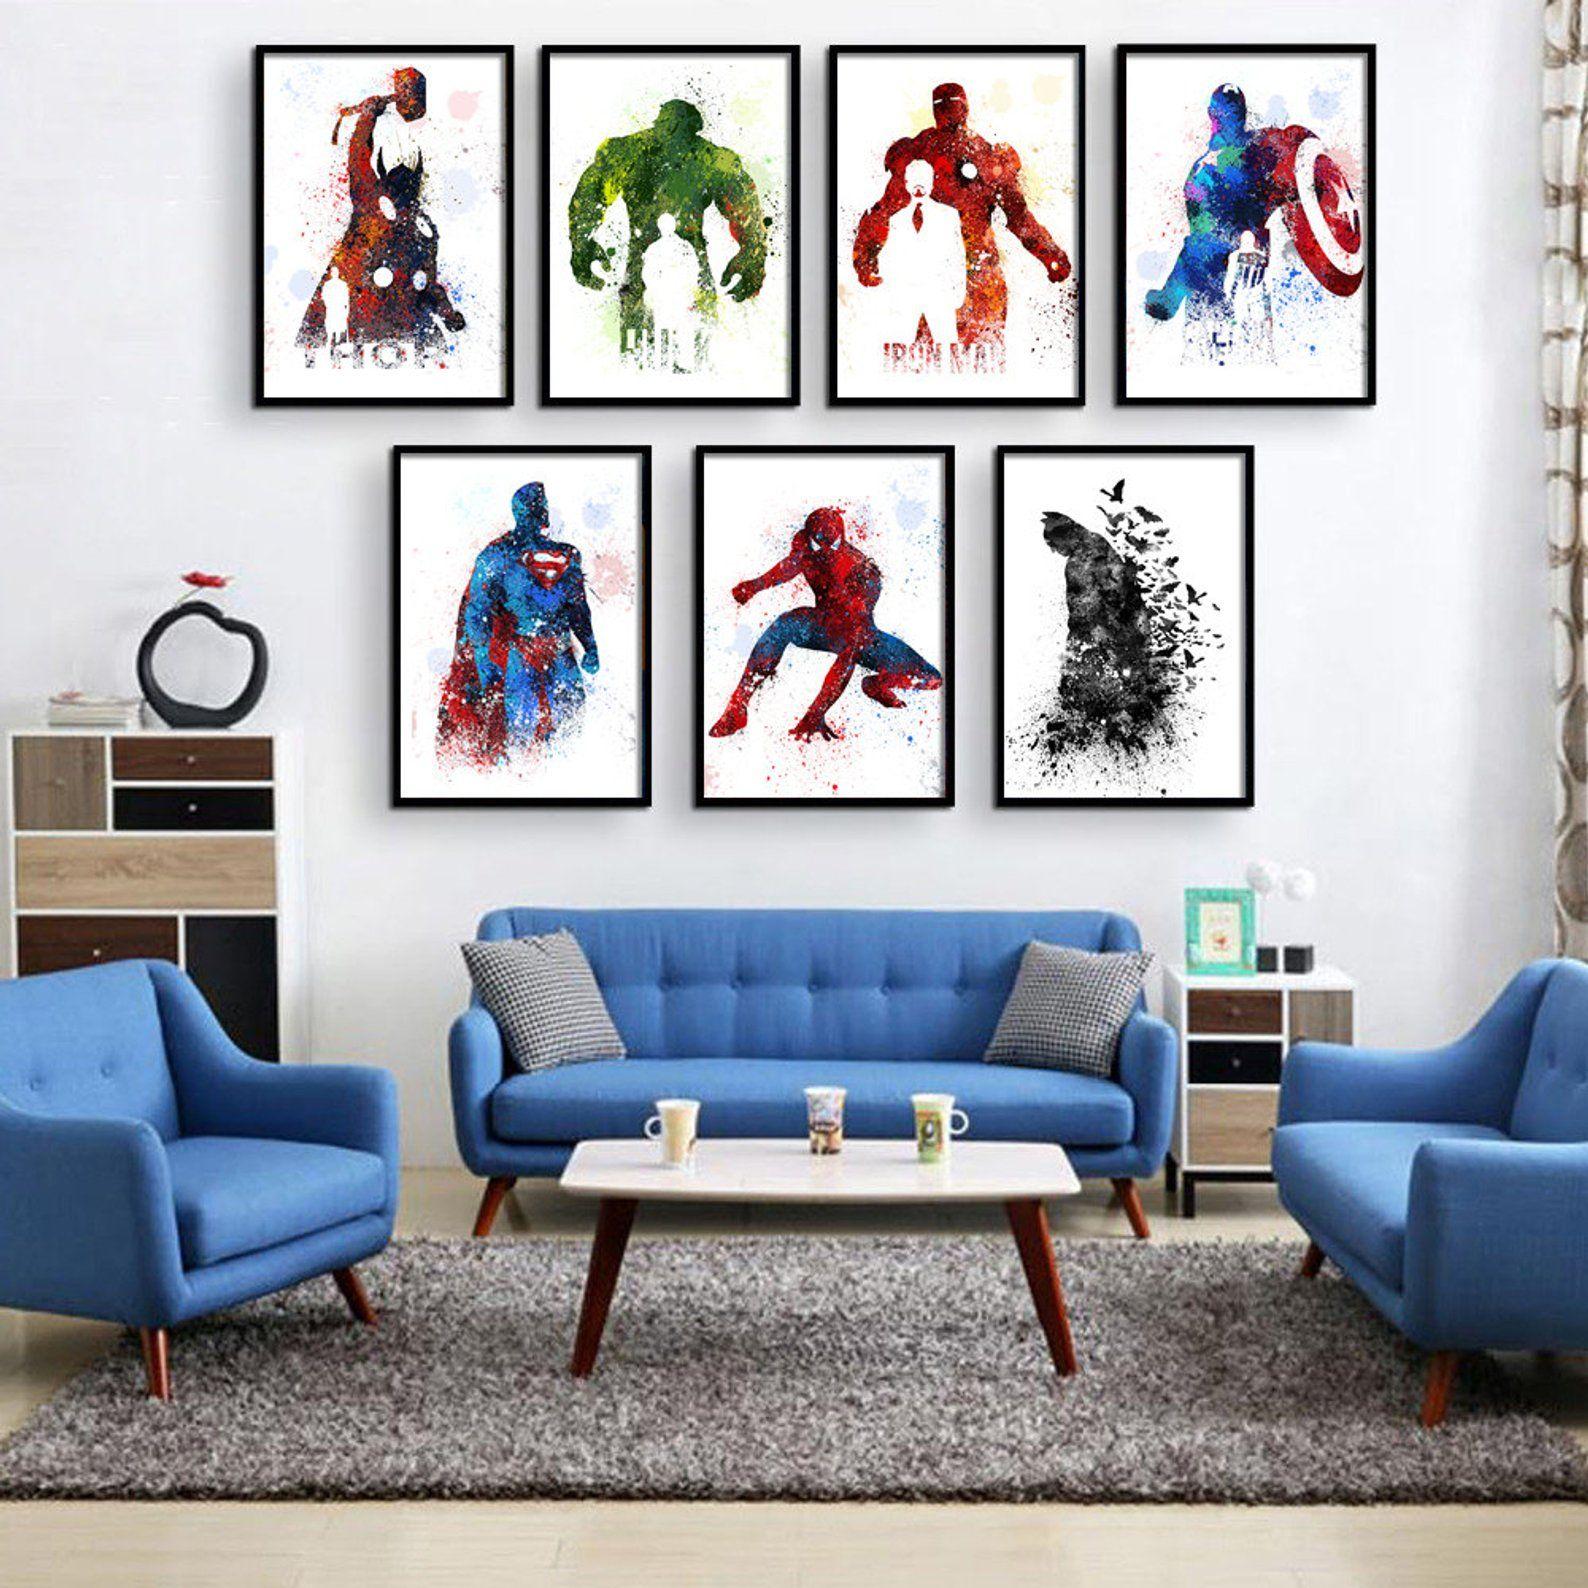 Superhero Decor Super Hero Wall Art Superhero Room Decor Etsy With Images Superhero Room Decor Boys Room Decor Superhero Wall Art